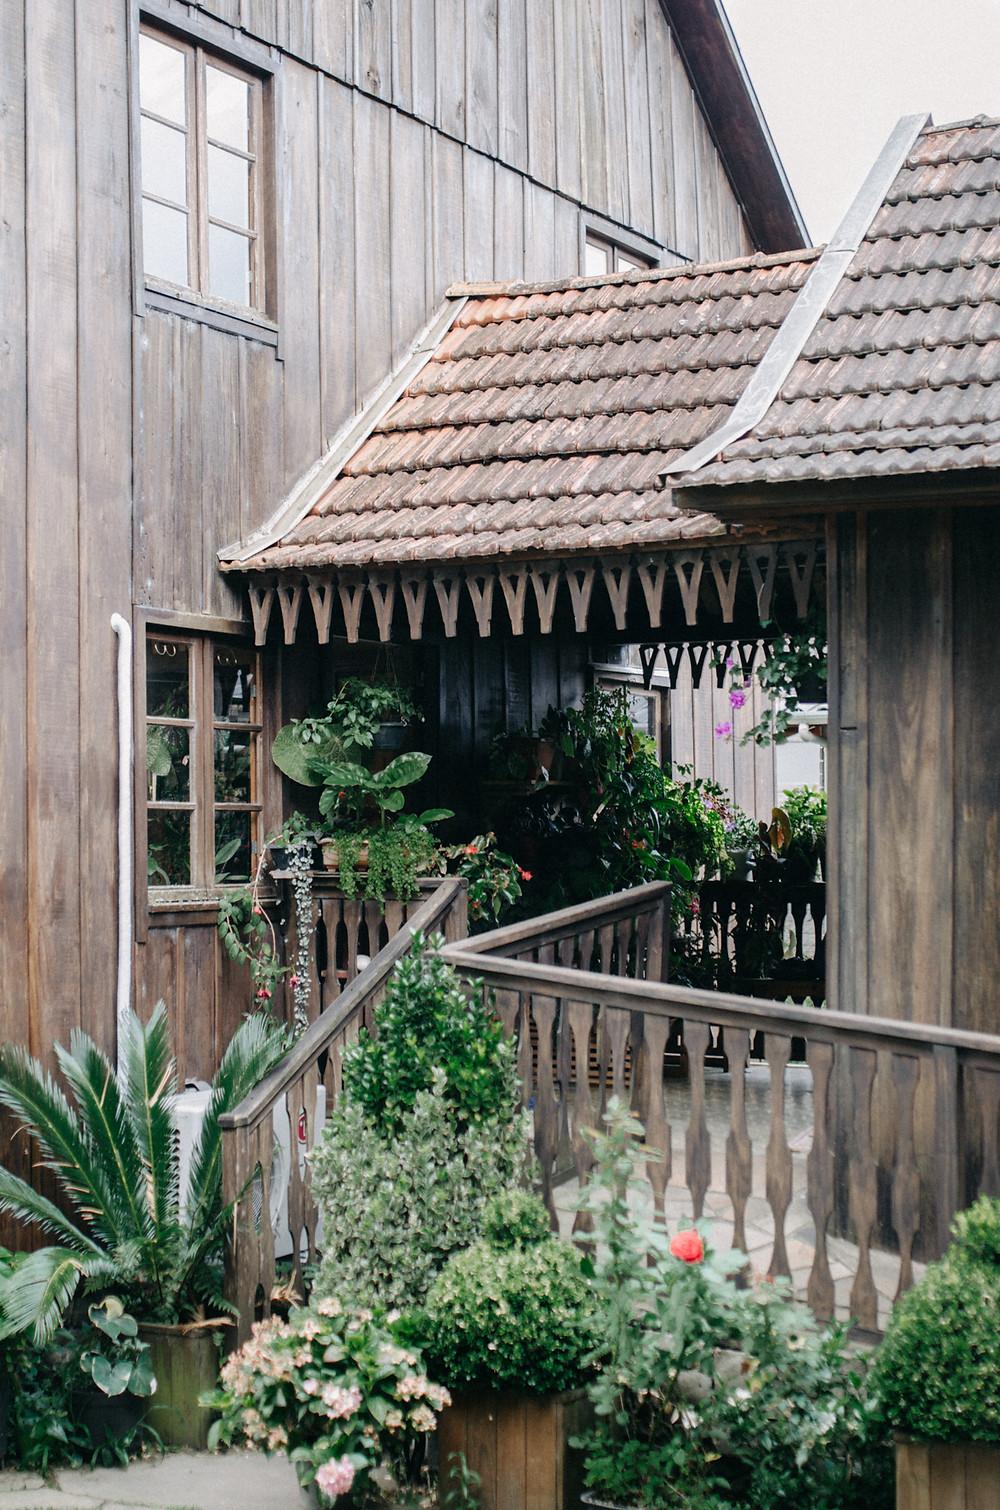 plants old house - Caminhos de Pedra, Bento Gonçalves - Brazil